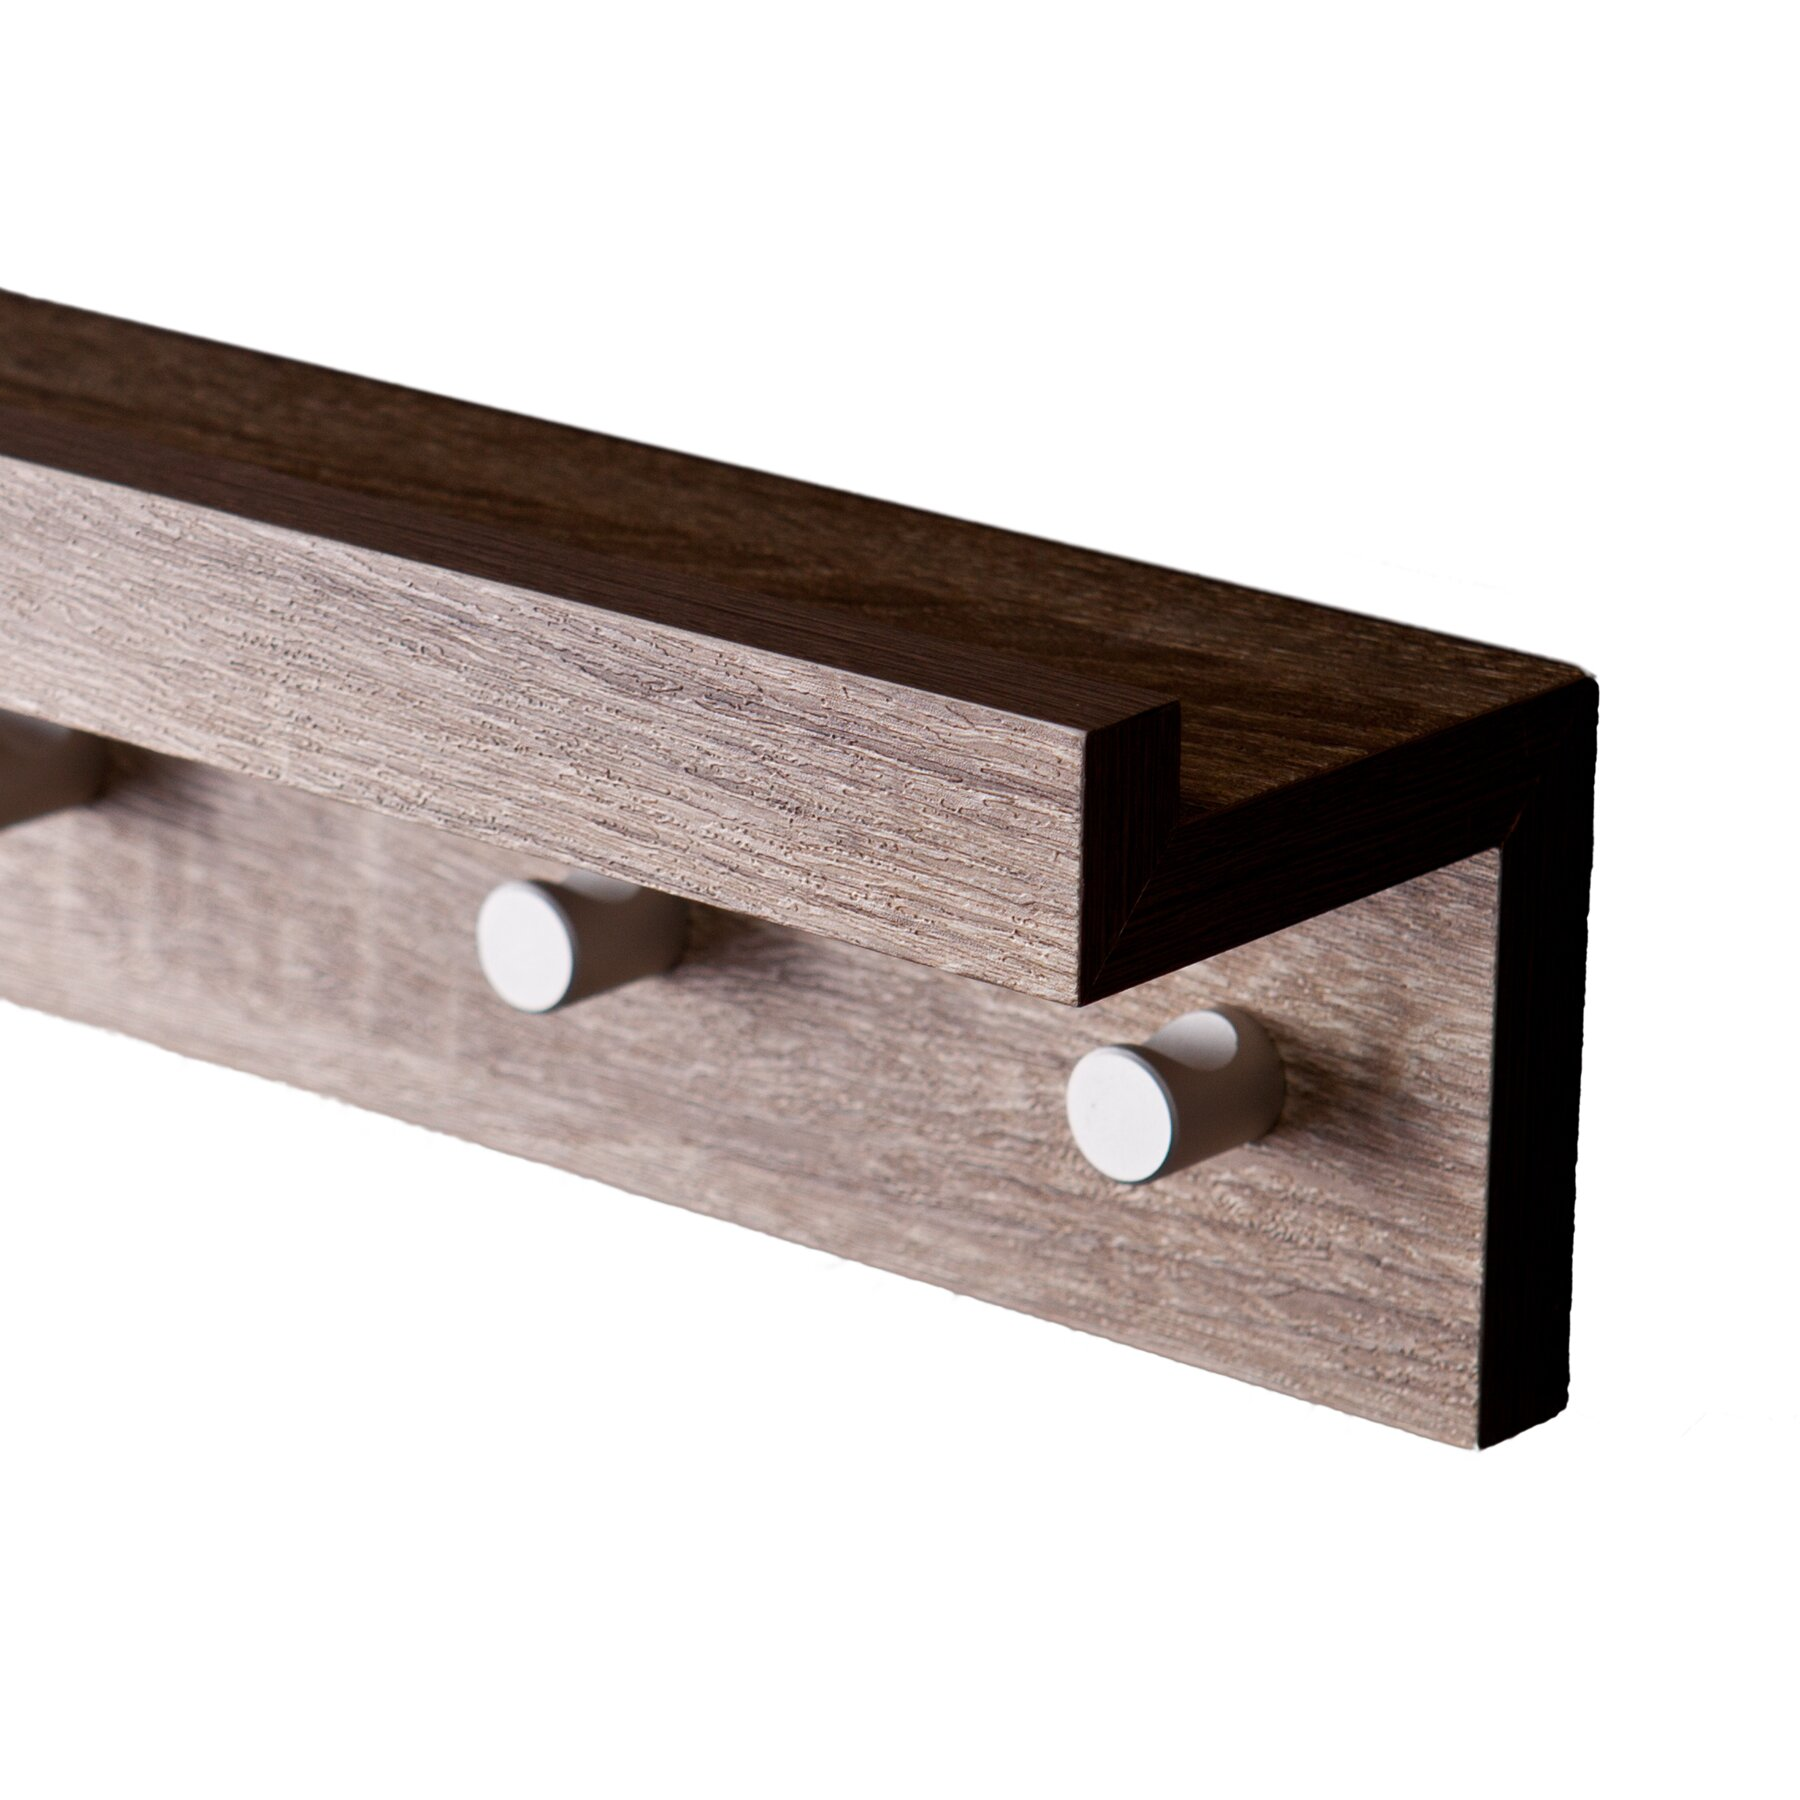 wildon home alex 4 hook wall mounted coat rack reviews wayfair. Black Bedroom Furniture Sets. Home Design Ideas